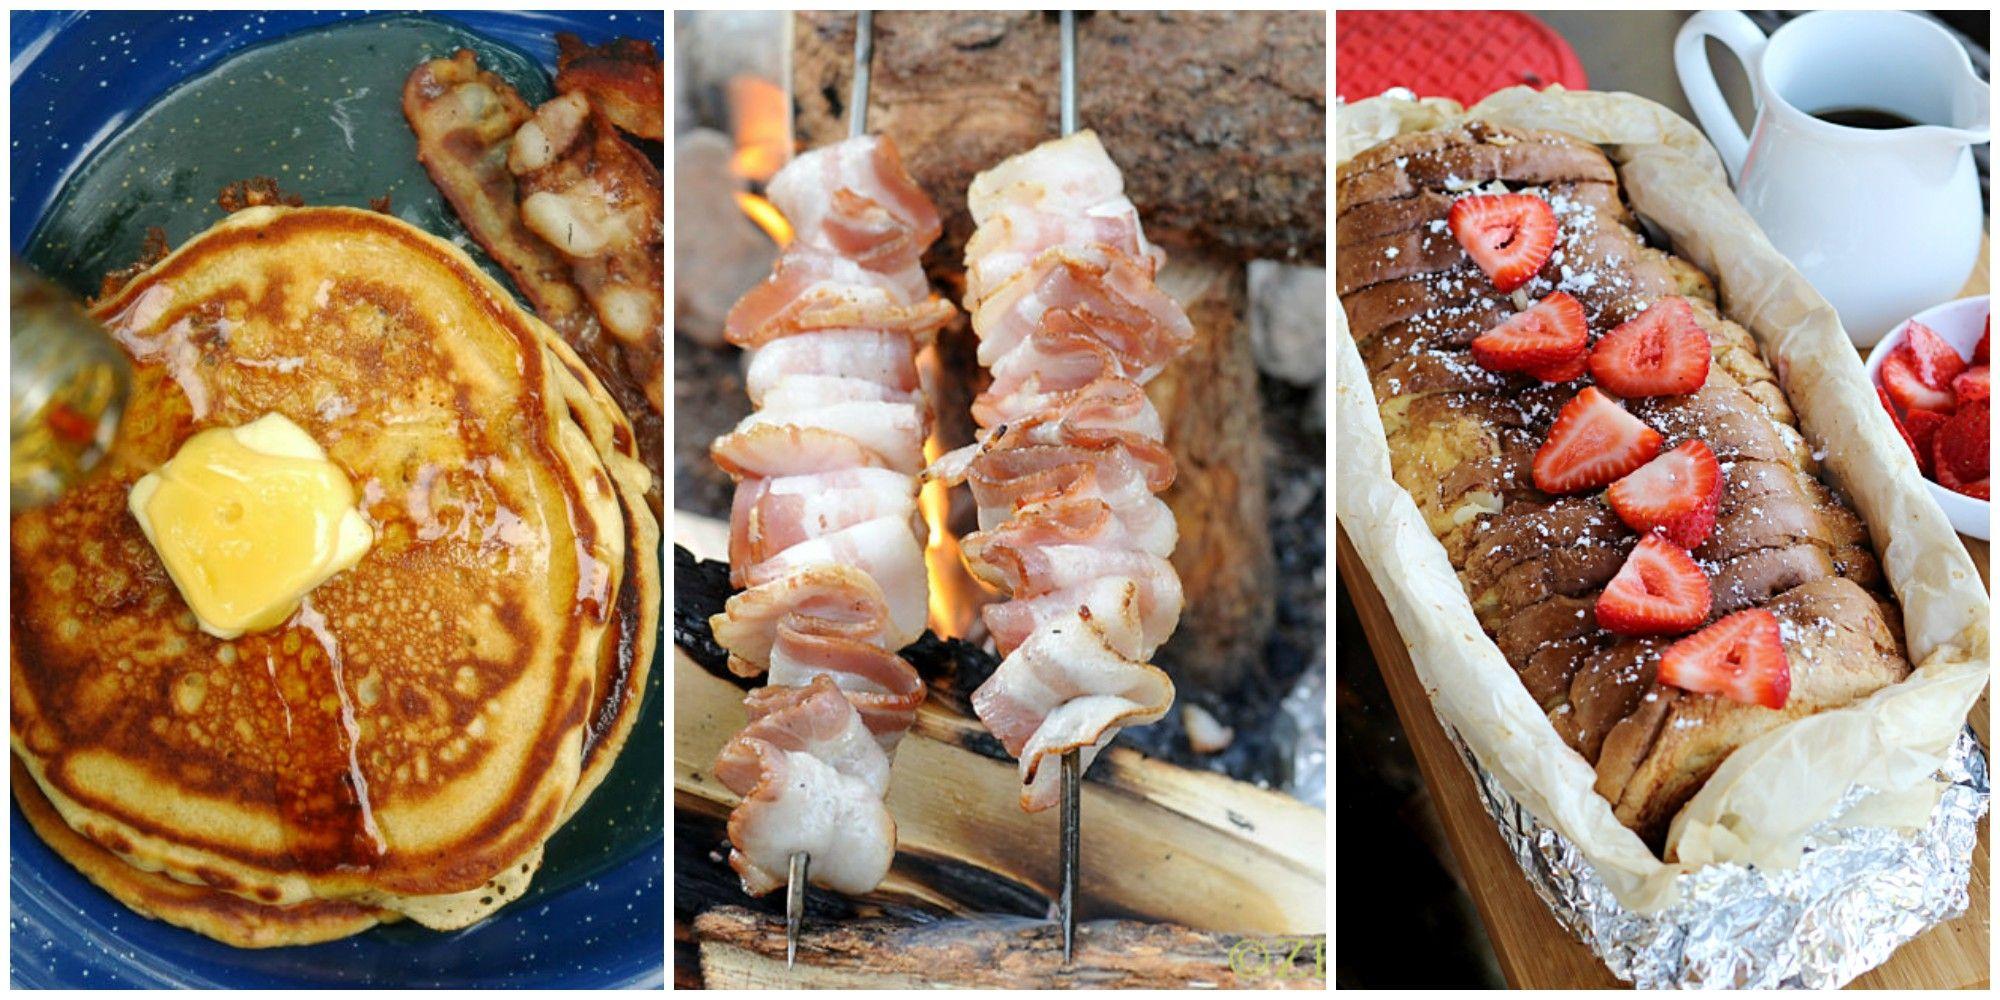 13 easy camping breakfast recipes - best campfire breakfast food ideas